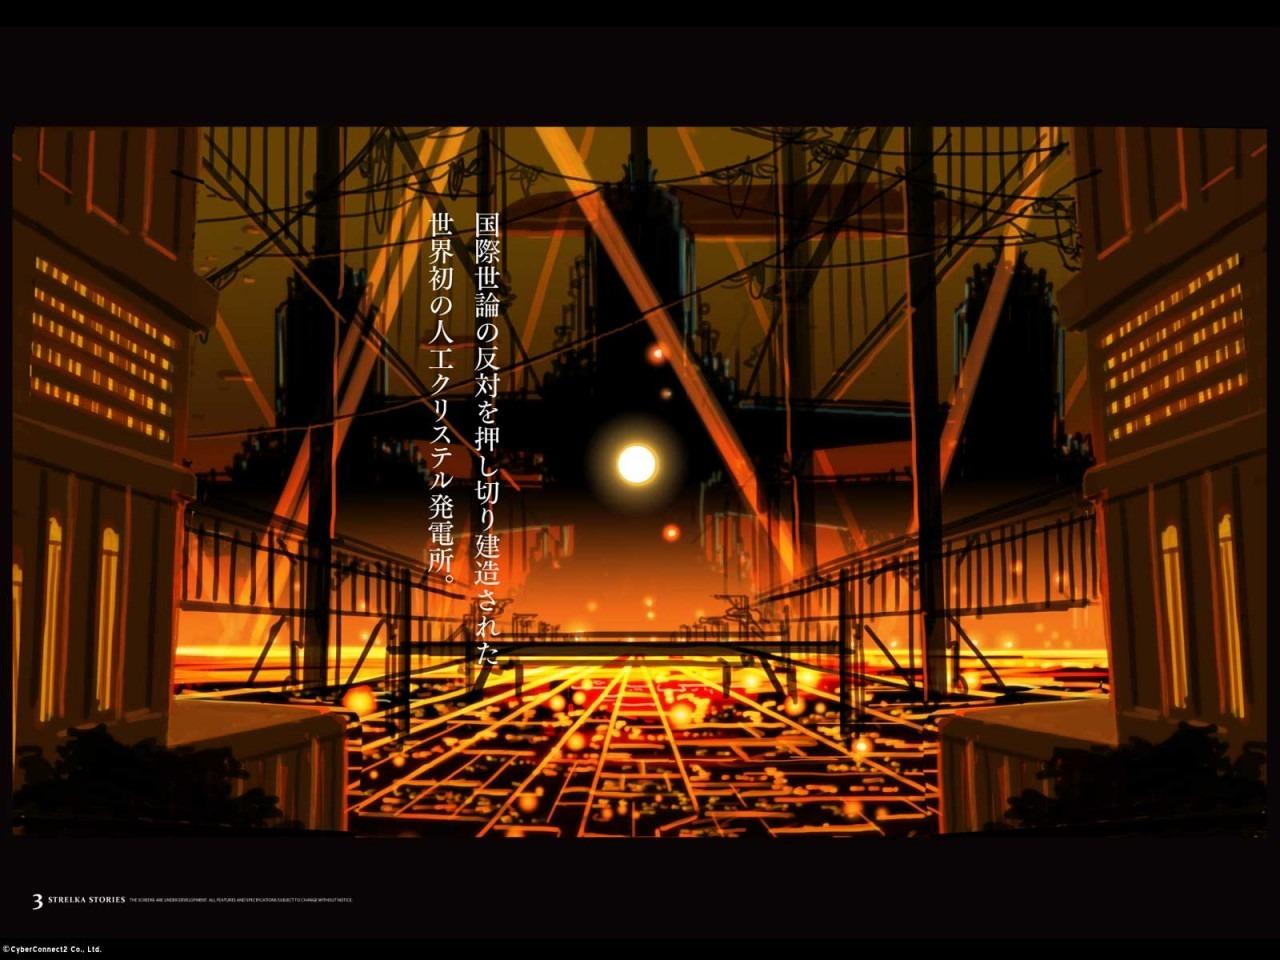 Strelka Stories, CyberConnect2, Actu Jeux Video, Jeux Vidéo, Playstation 3,